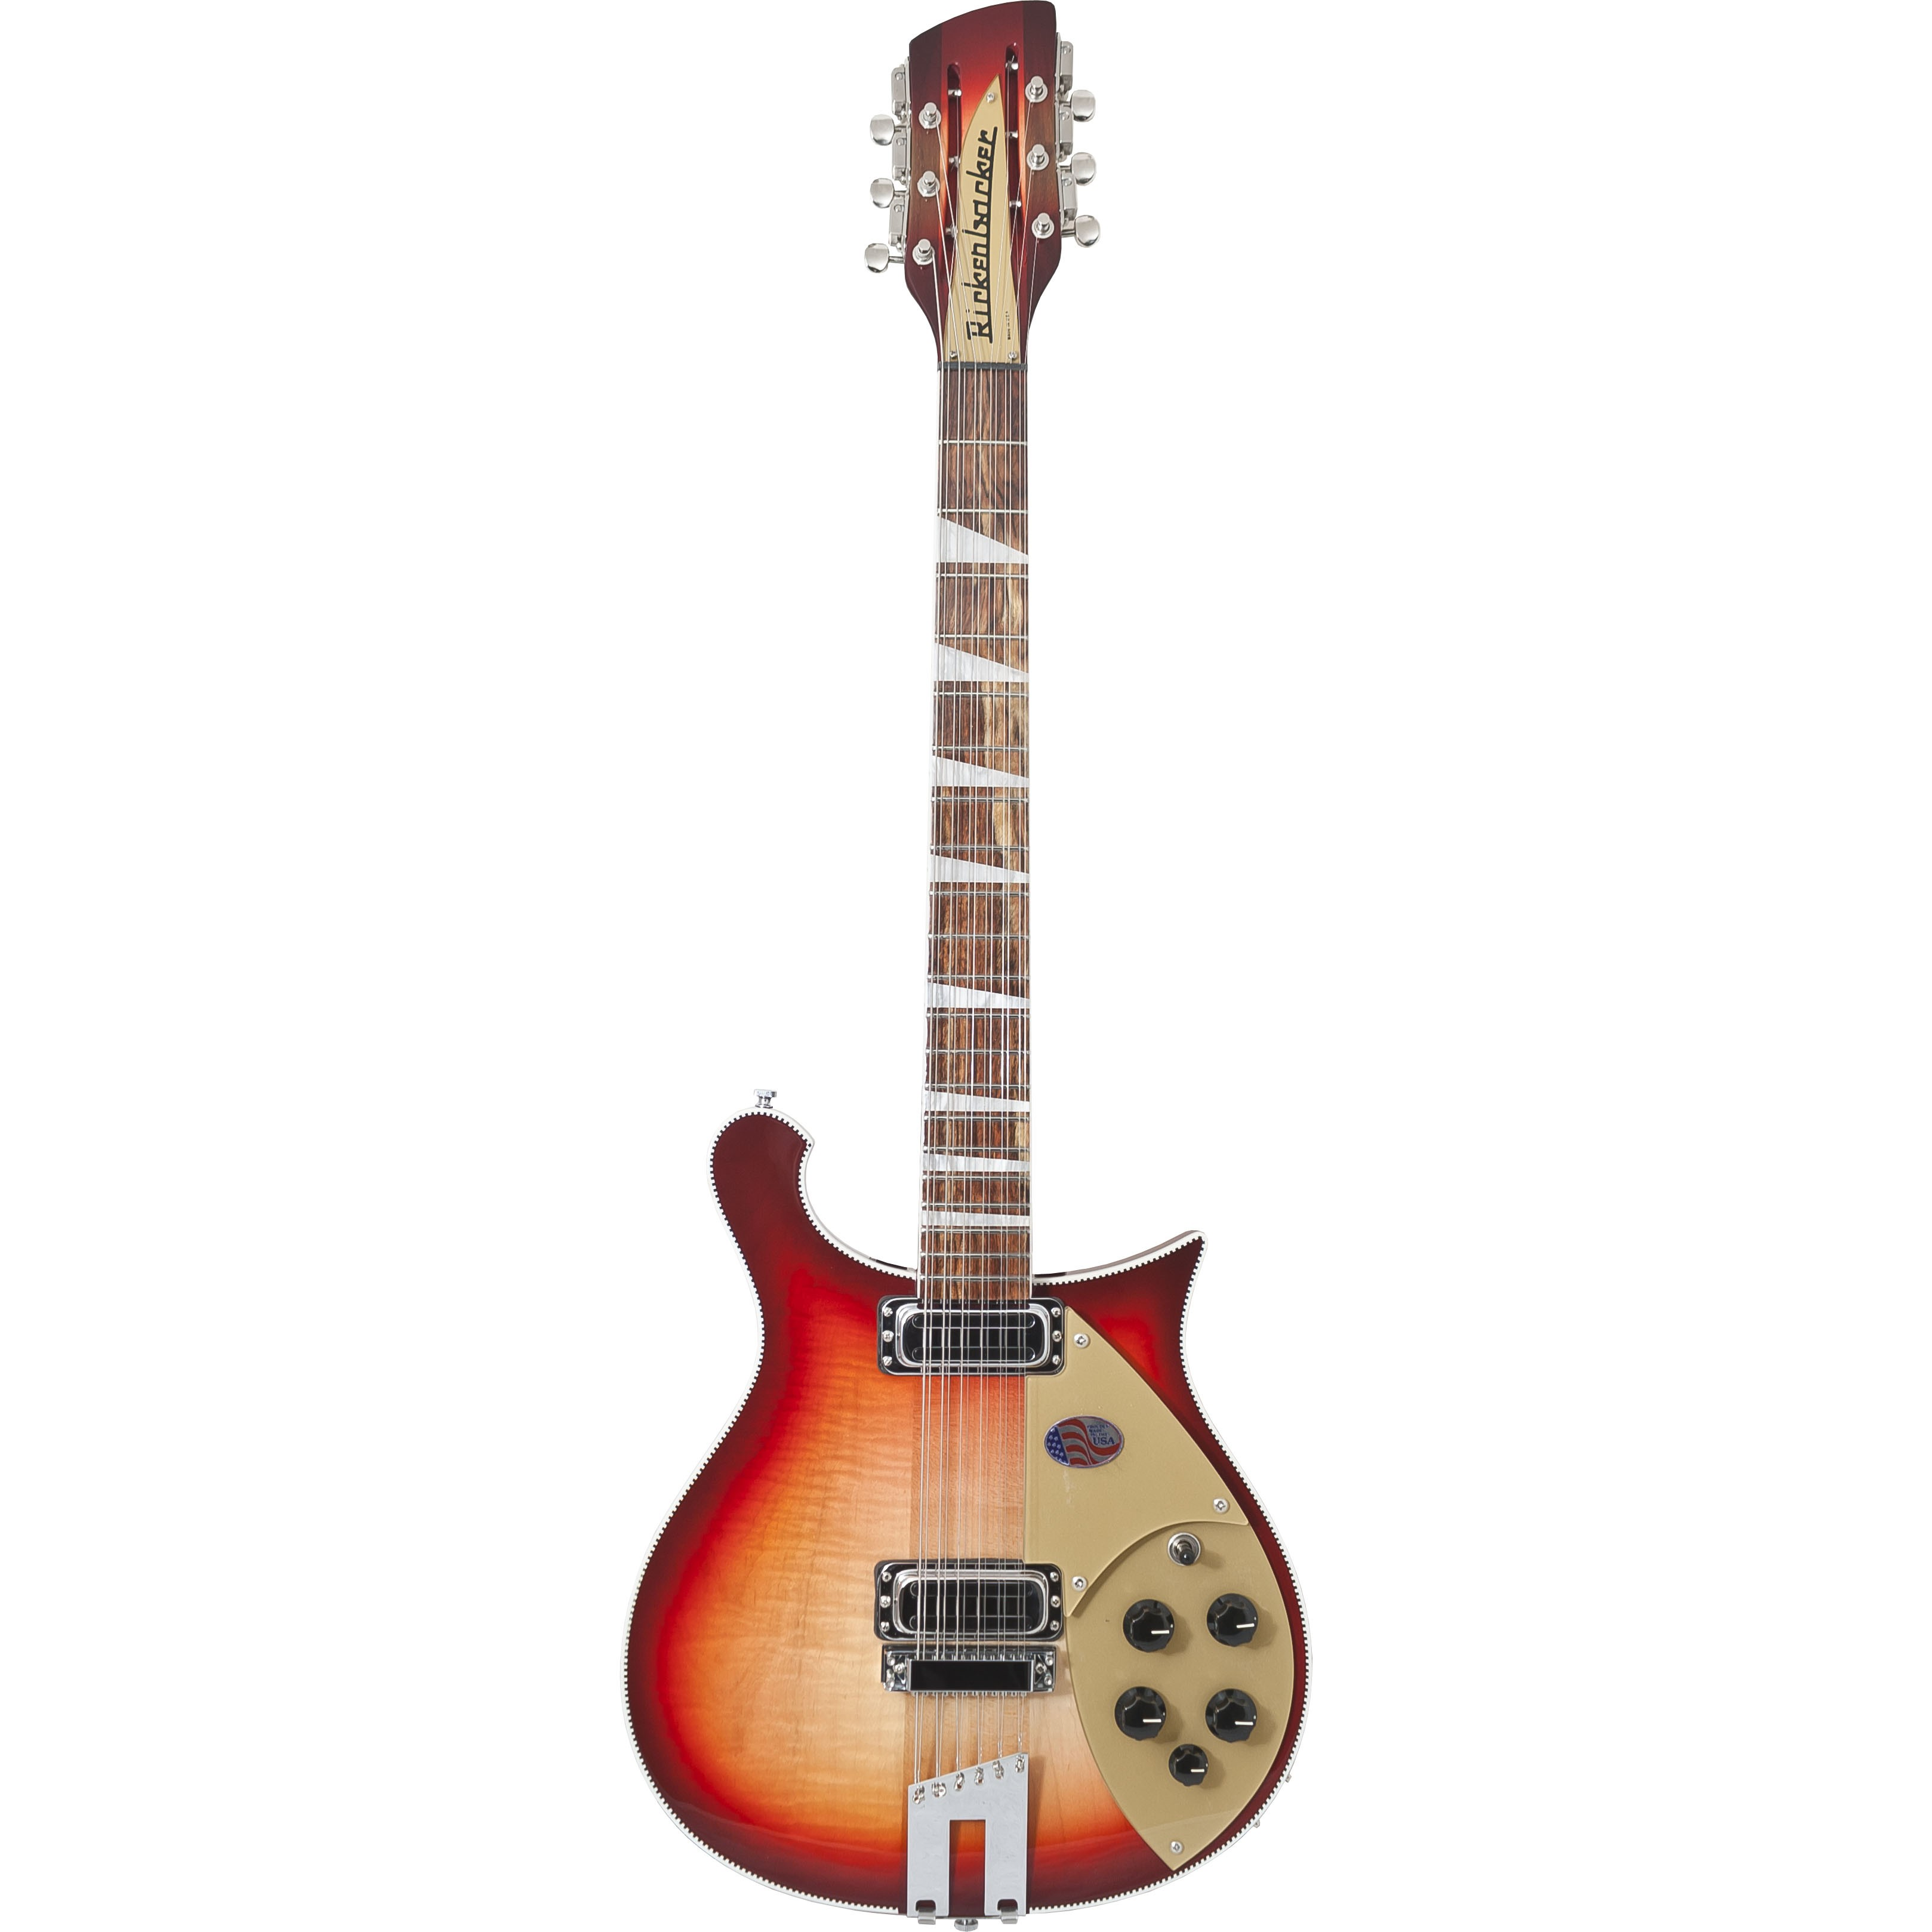 Rickenbacker 660/12 - Fireglo